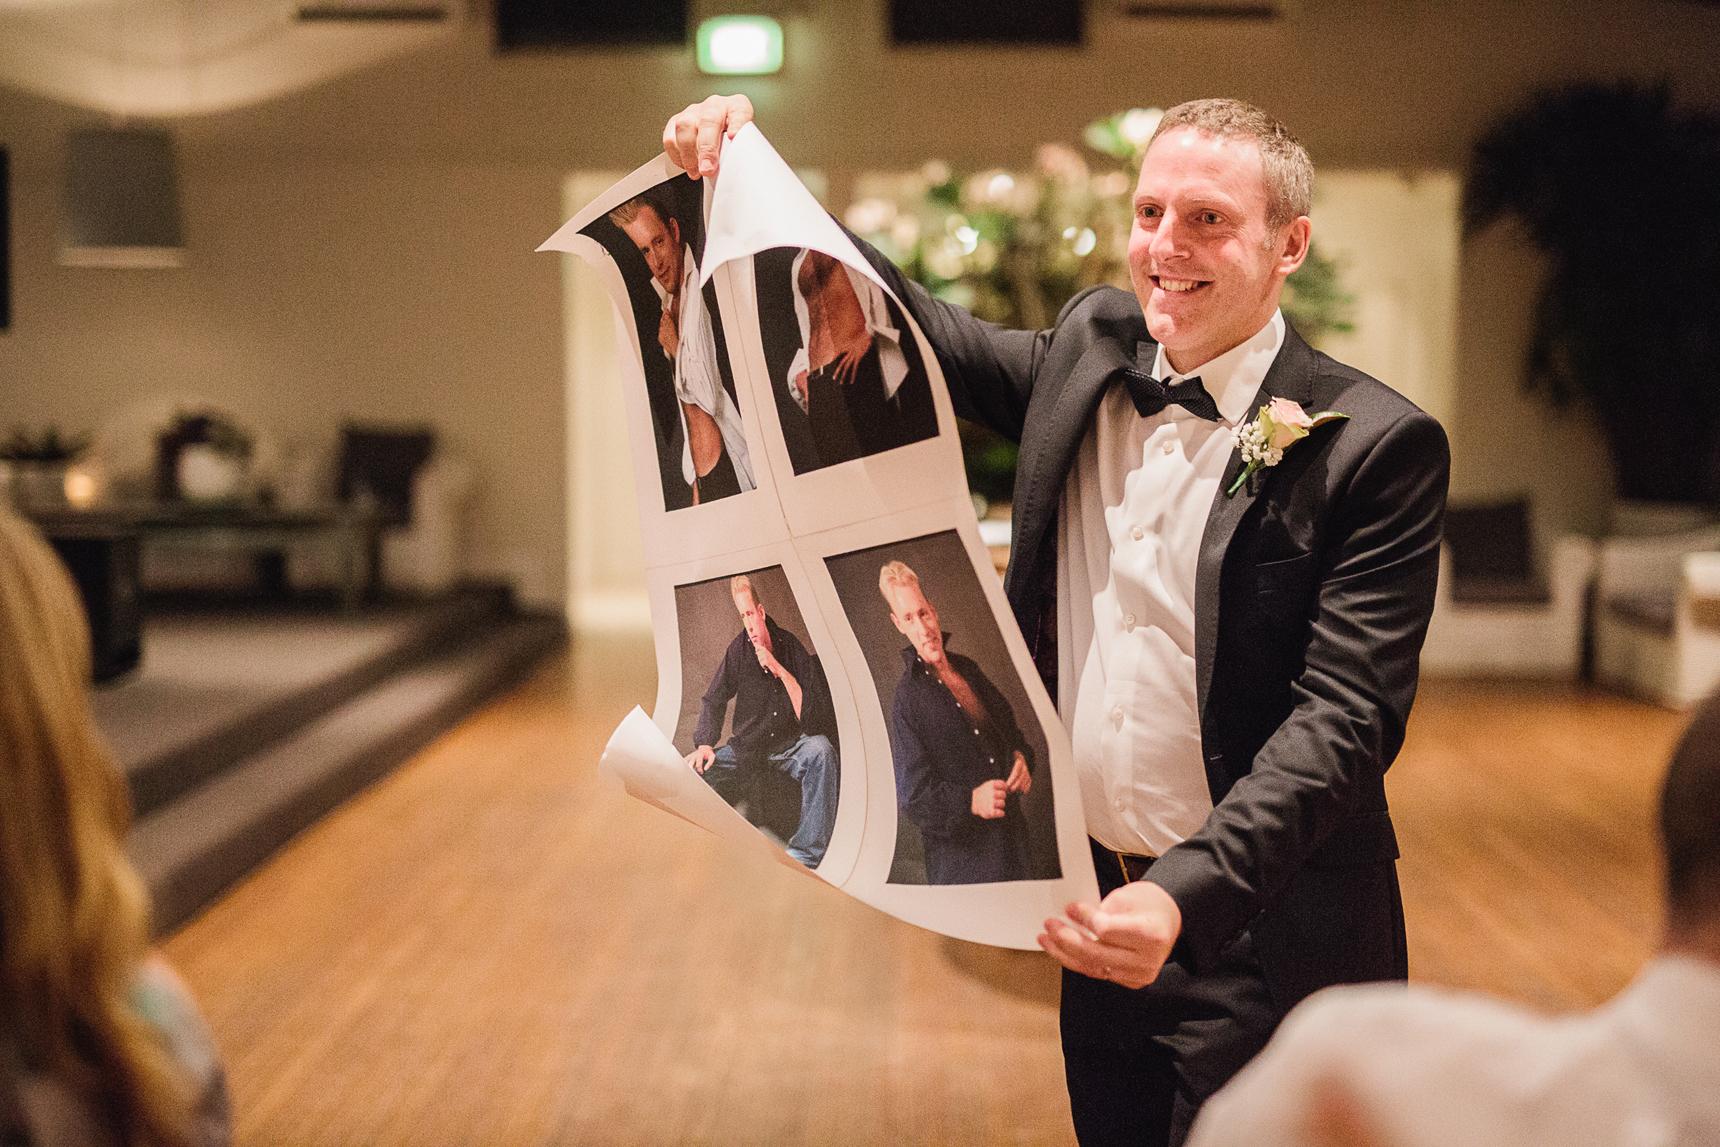 AngeRuss_MobyDicks_WhaleBeach_Wedding_Photography045.jpg